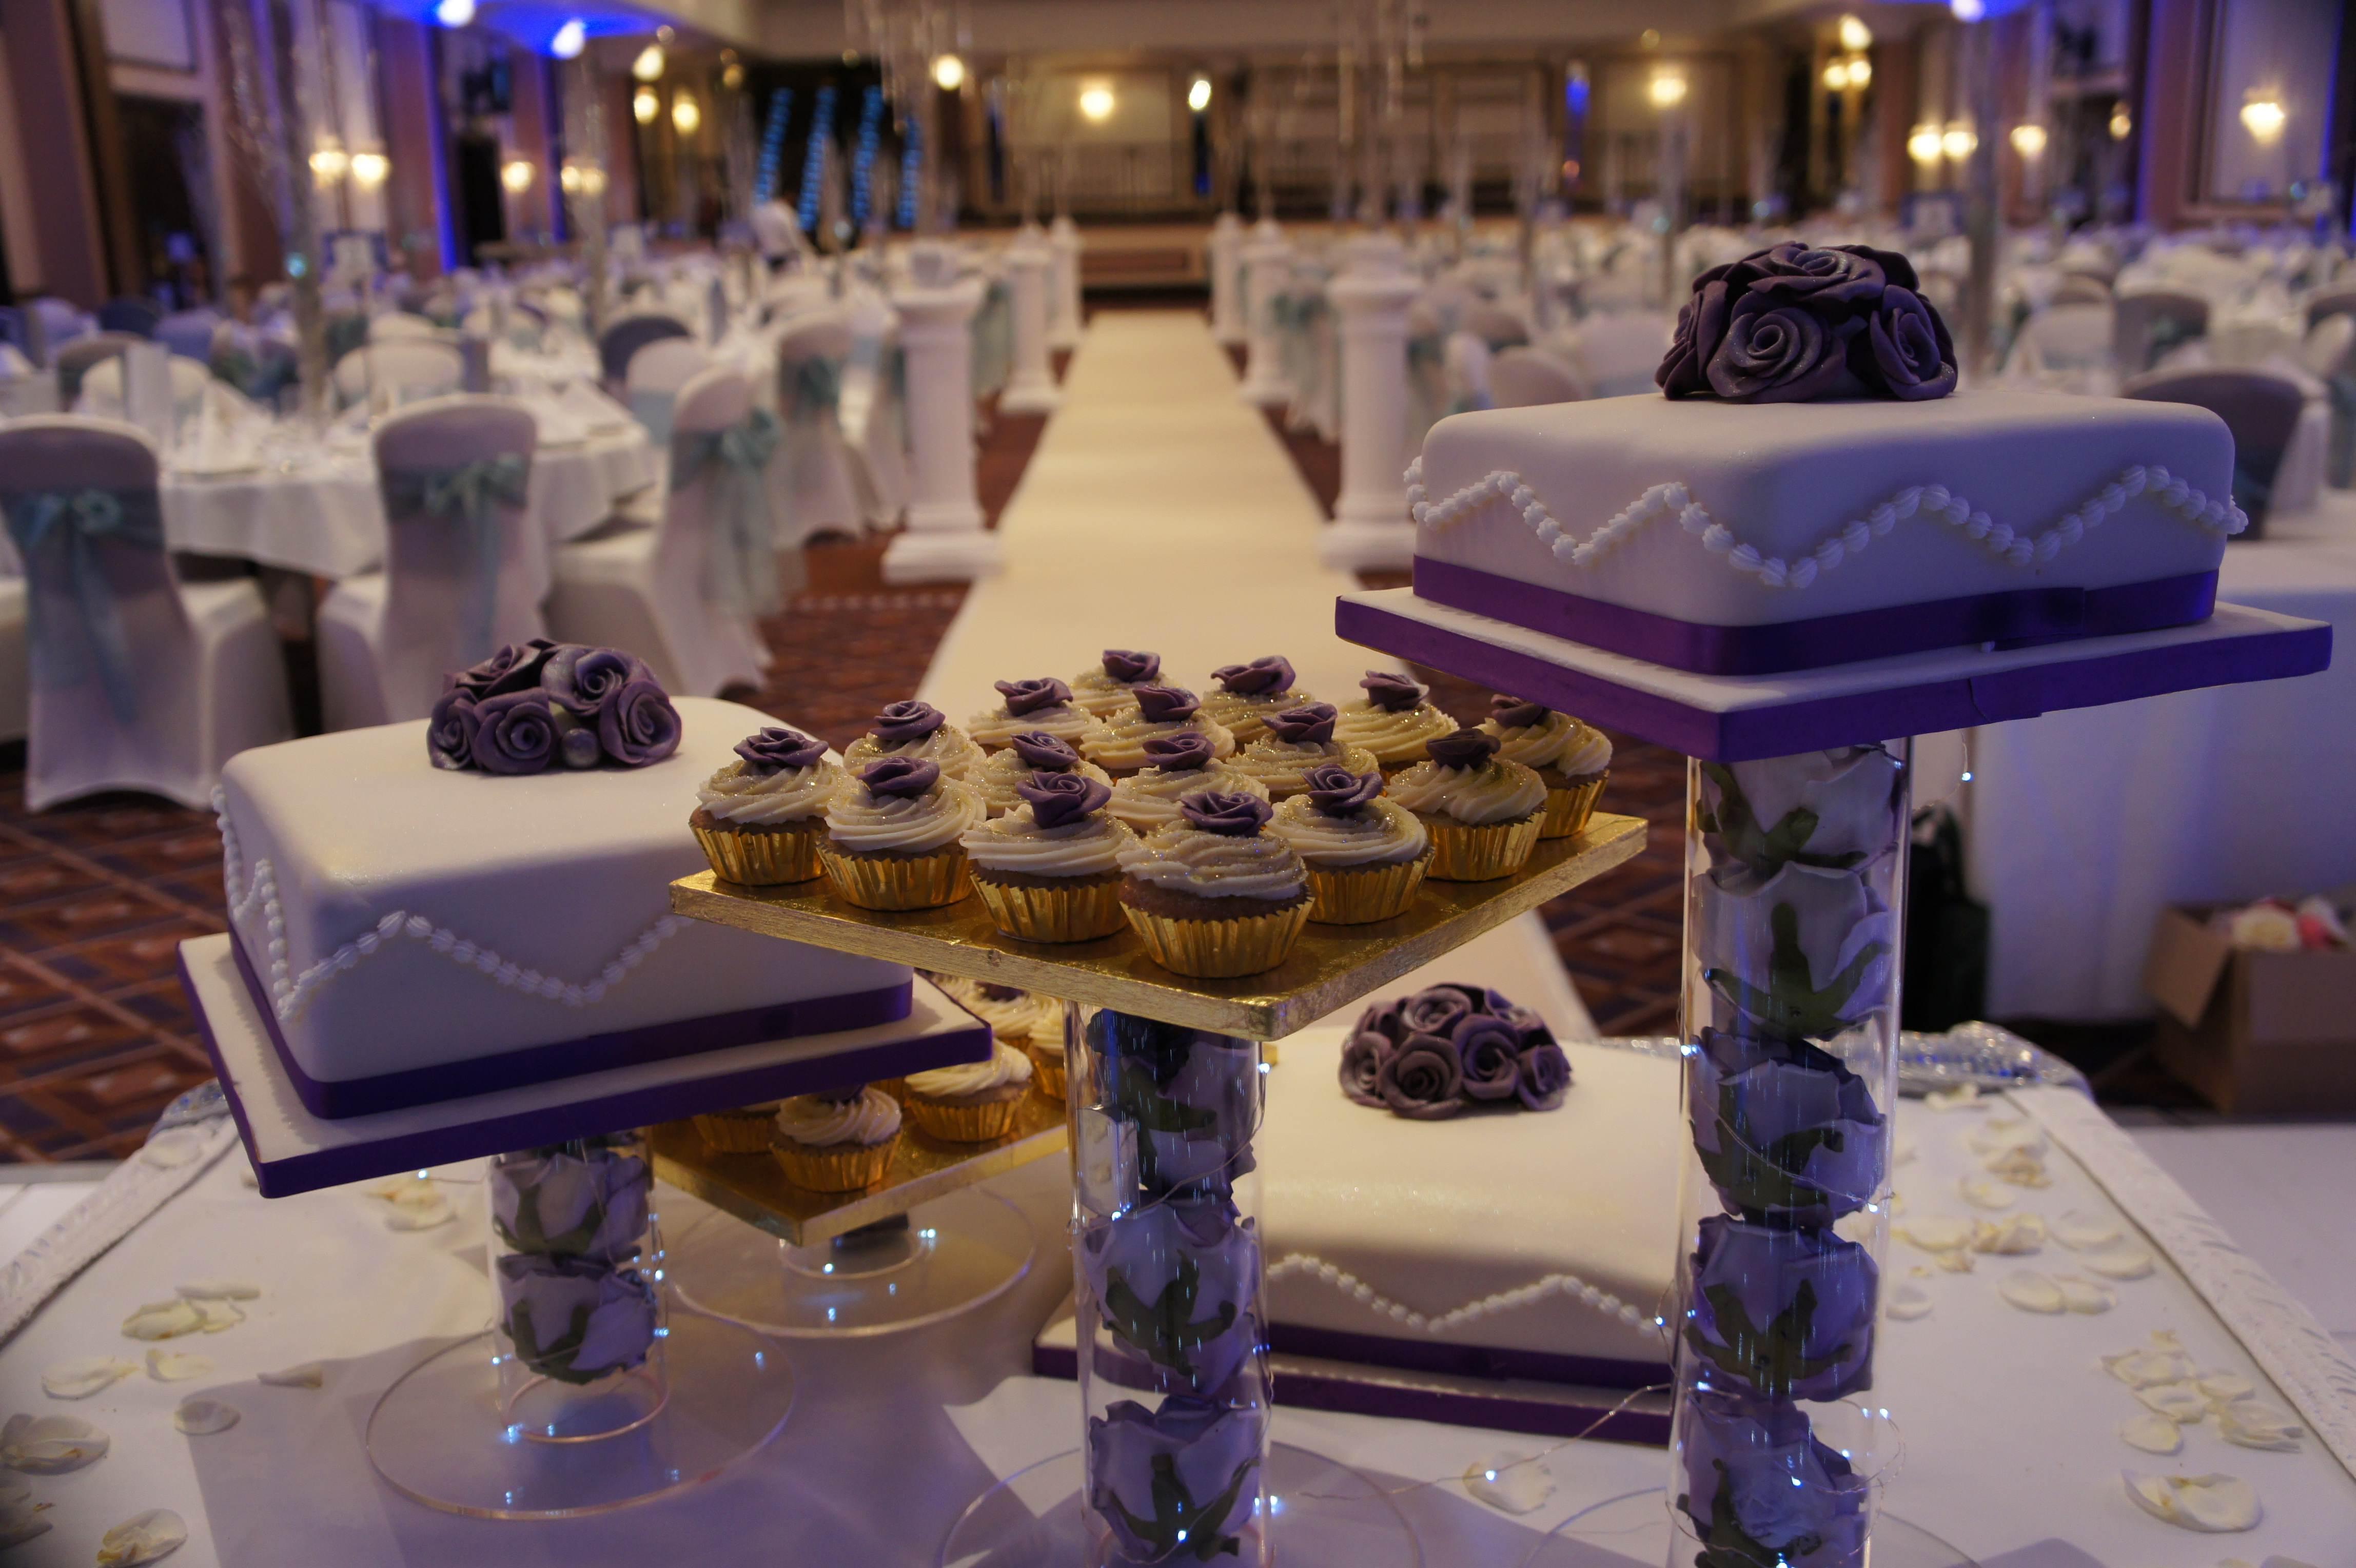 tag wedding cake stand wedding cake stands wedding cake stand with lights